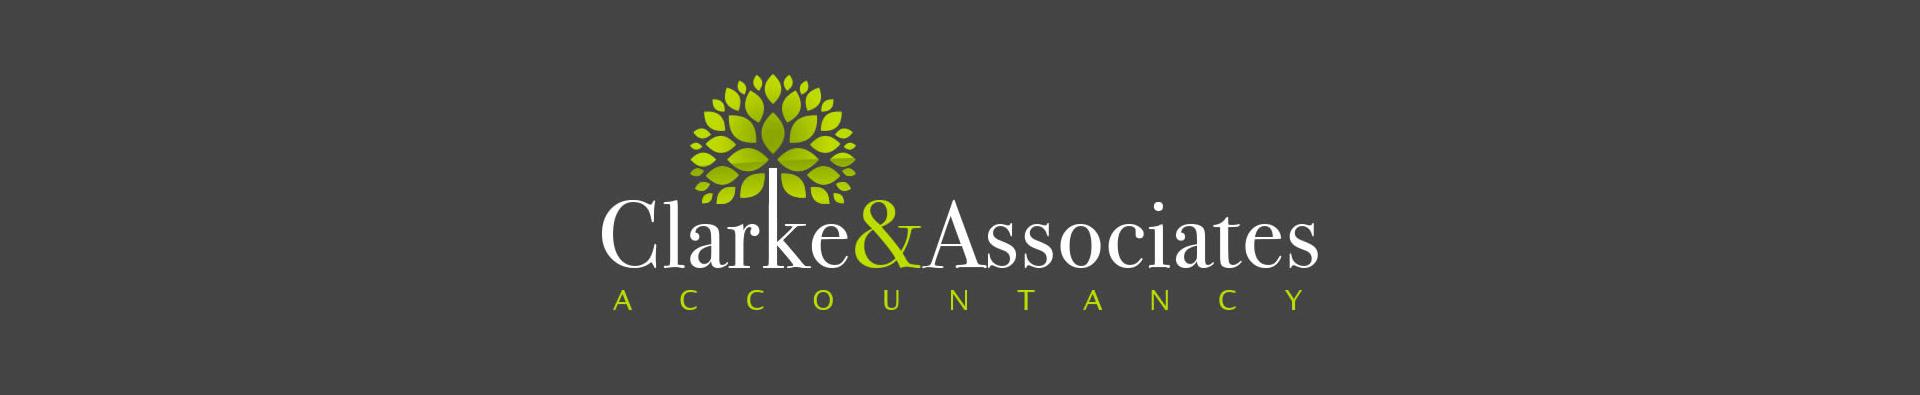 Clarke & Associates Accountancy